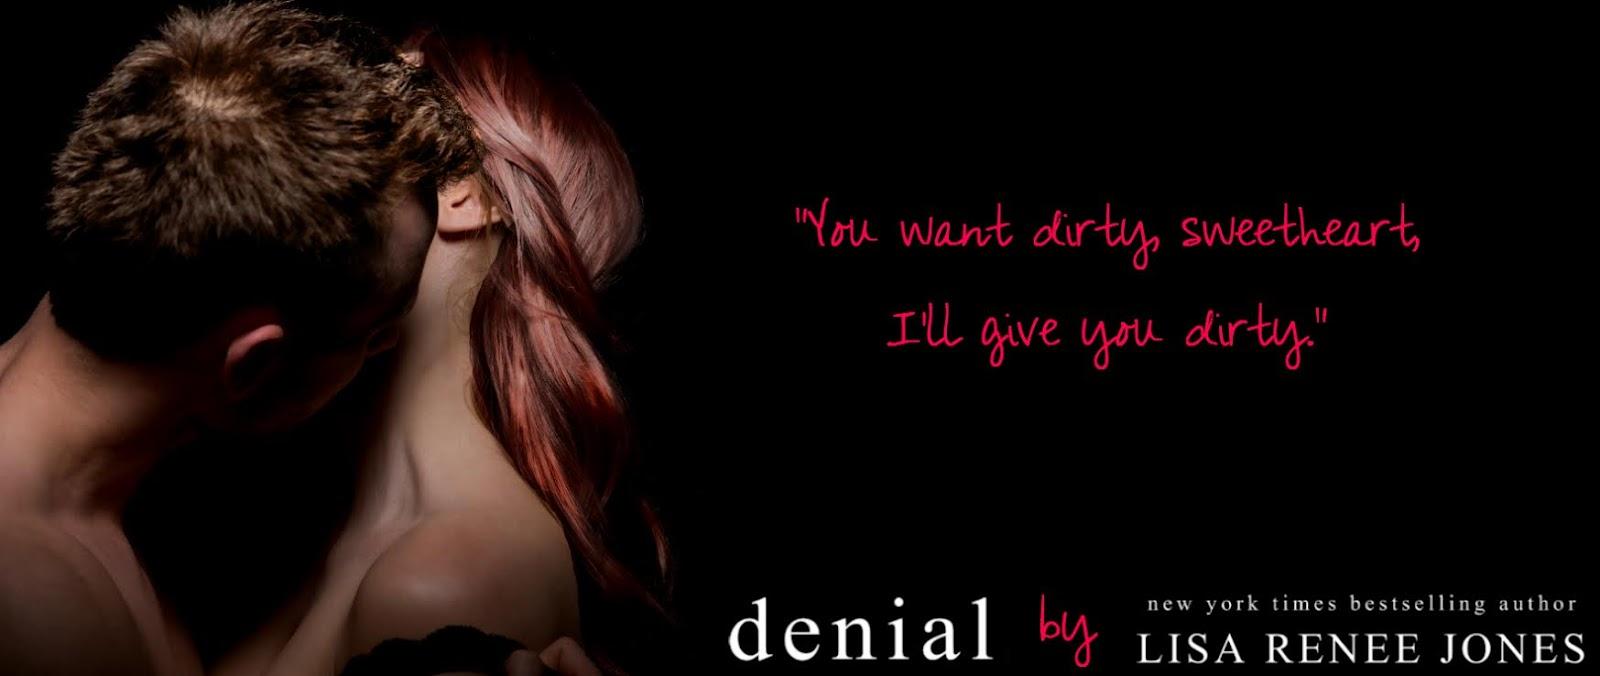 denial excerpt banner.jpg